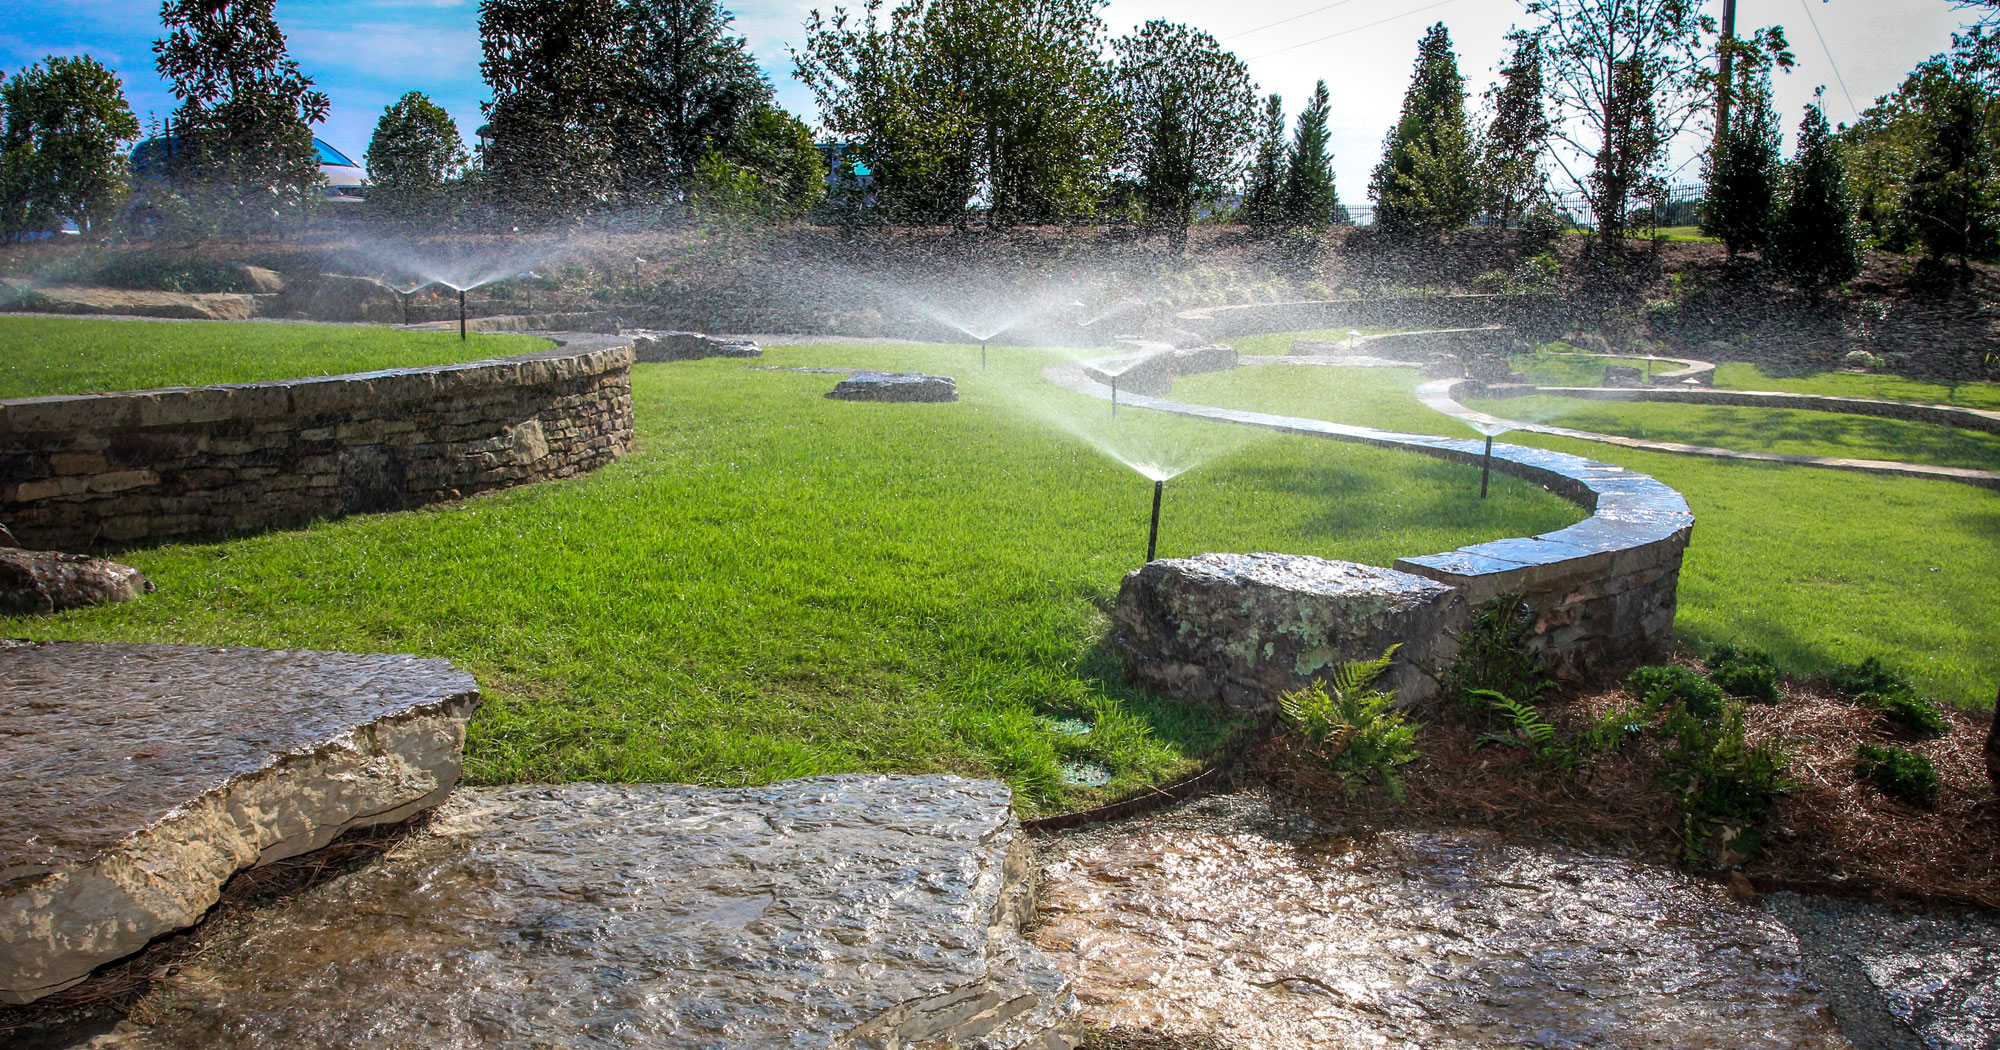 Irrigation-spray heads